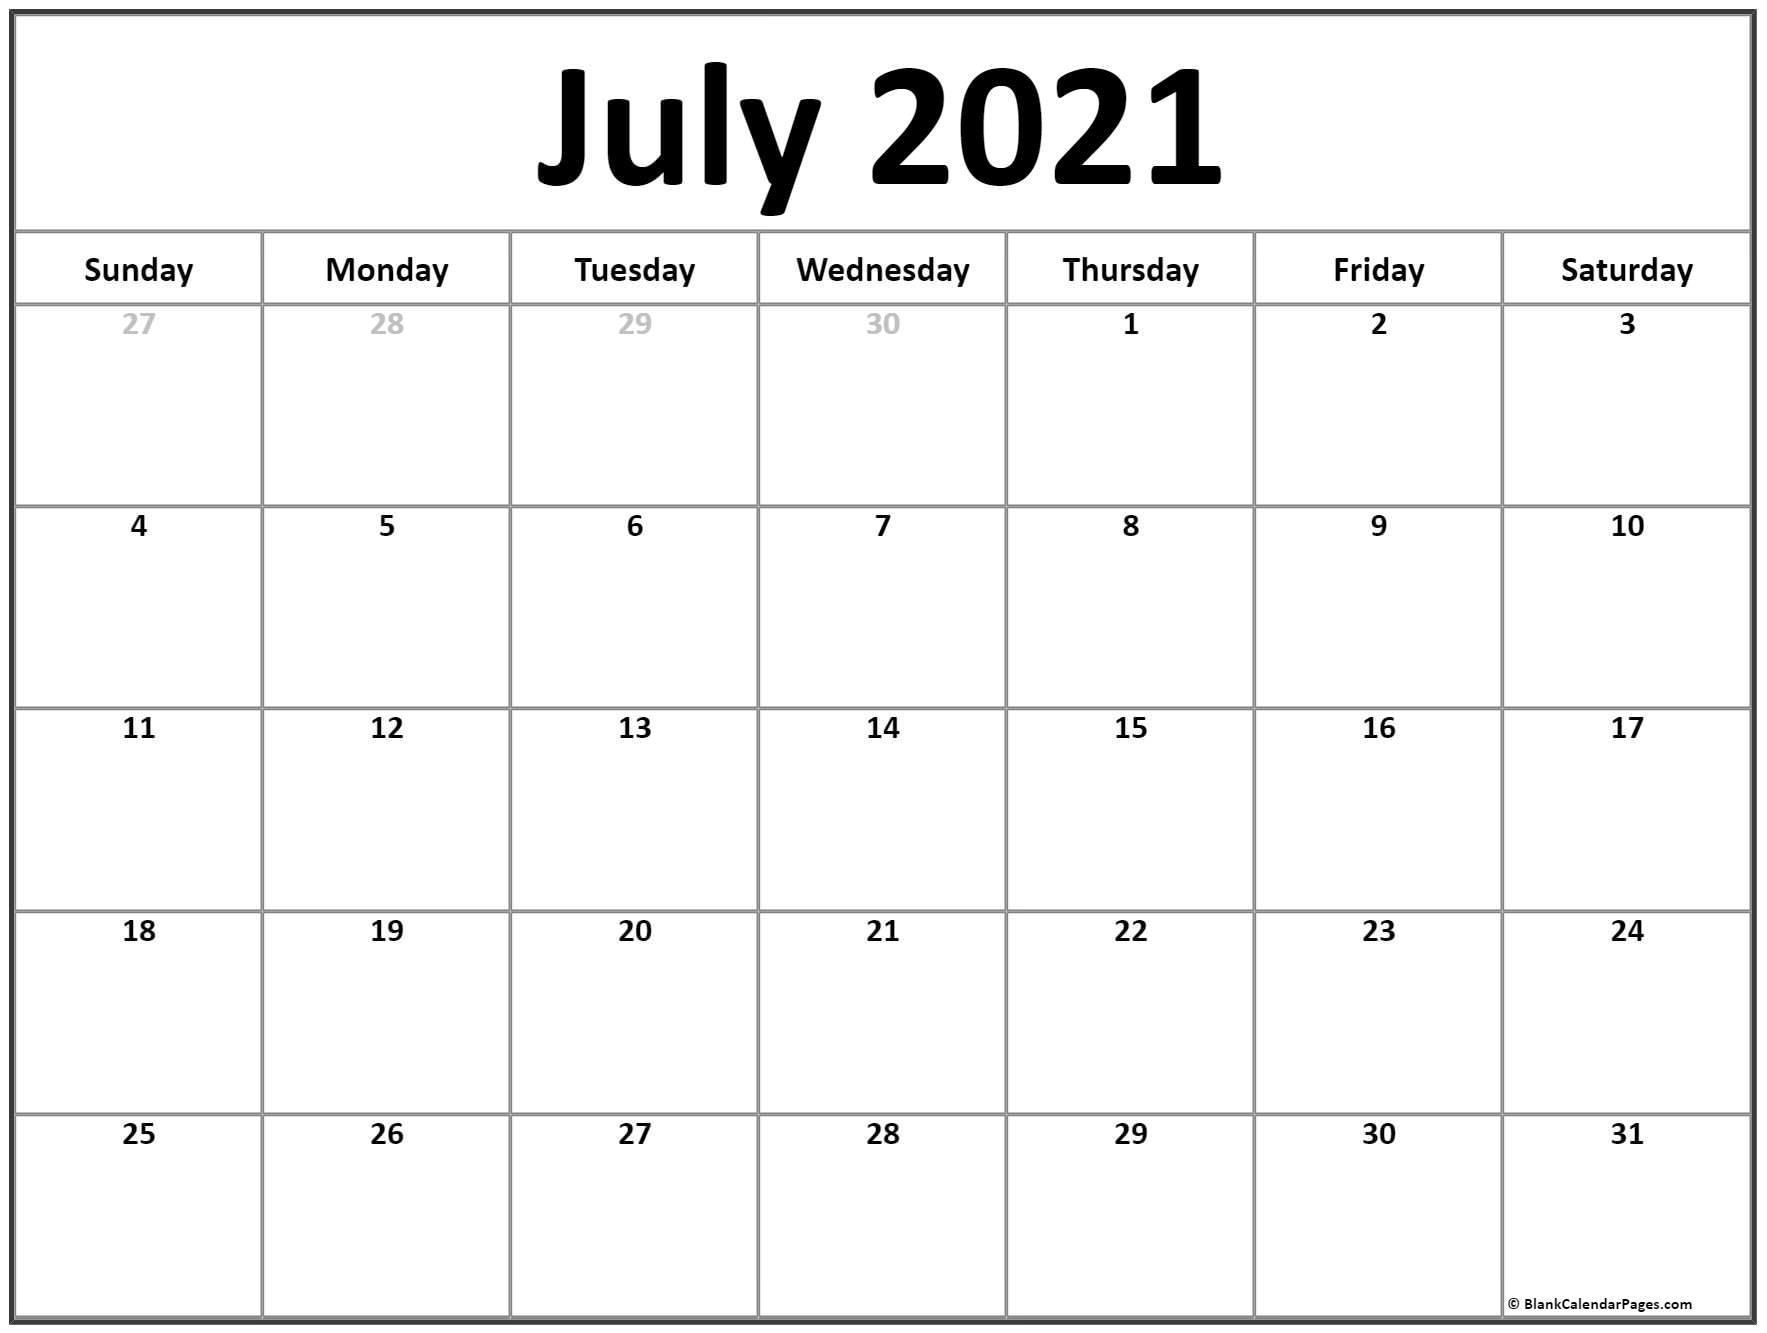 July 2021 Calendar   Free Printable Calendar Templates throughout 3 Month Blank Printable Calendar 2021